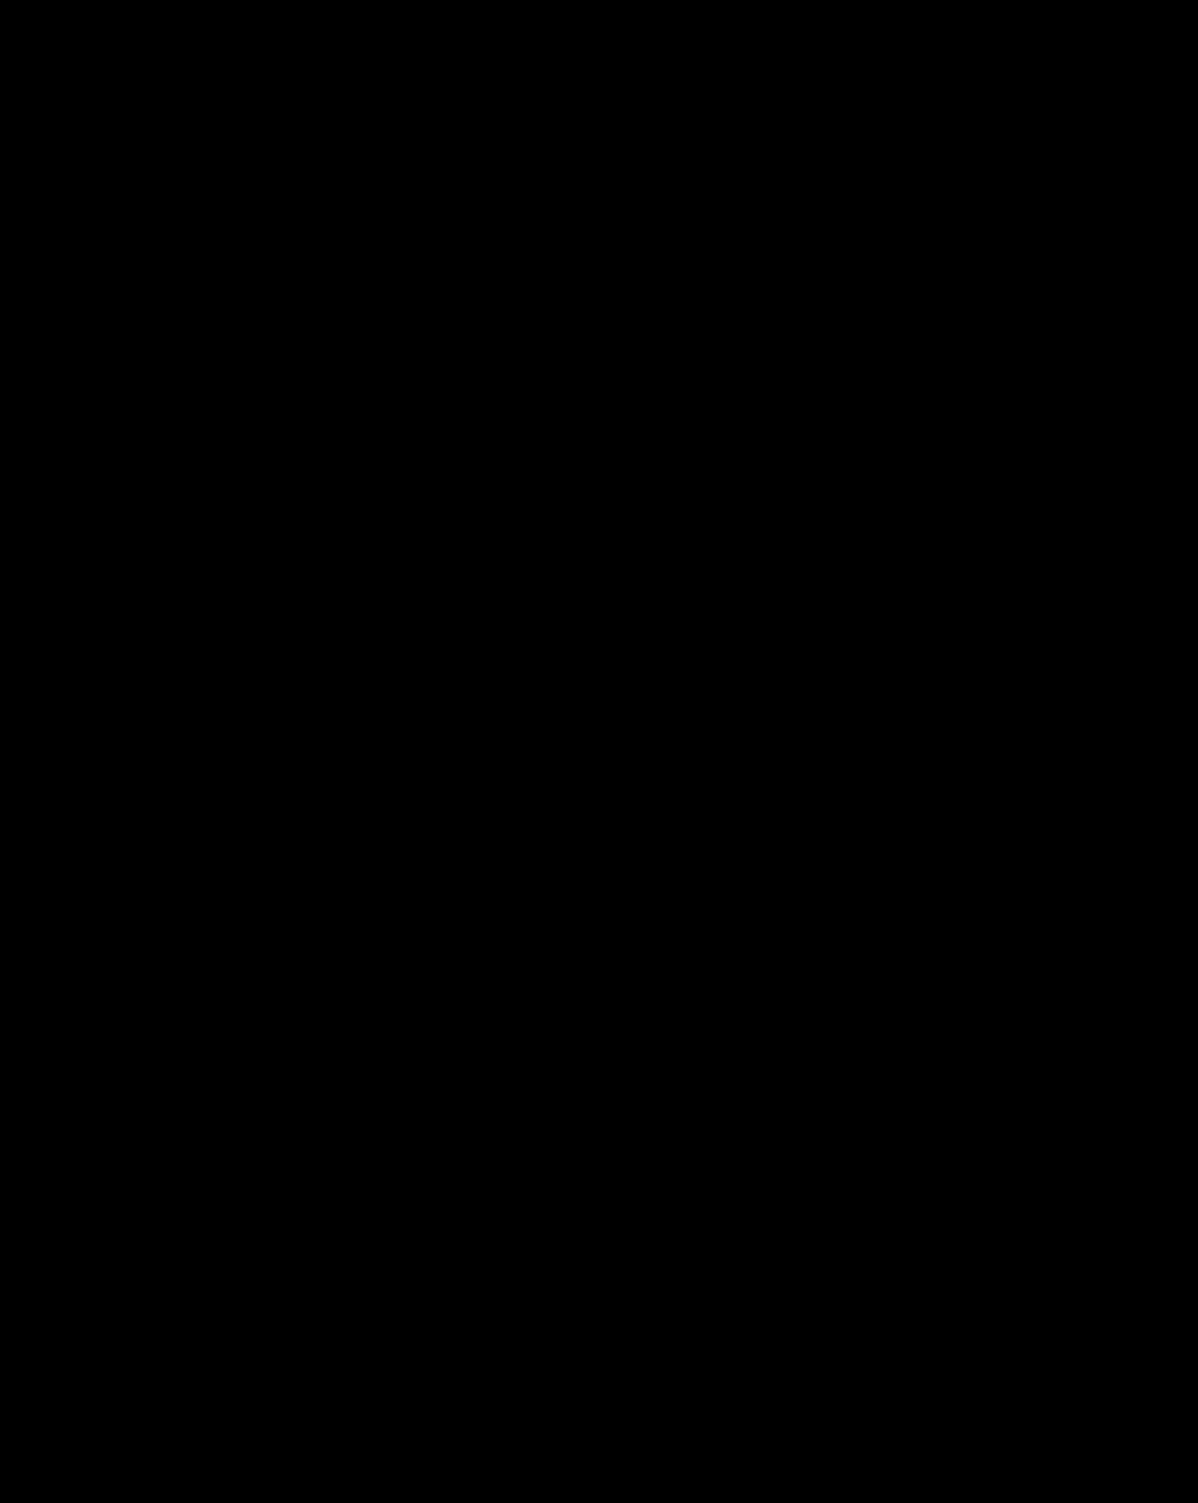 68259155-8d8e-4ba7-a3da-482aebfbdb3f